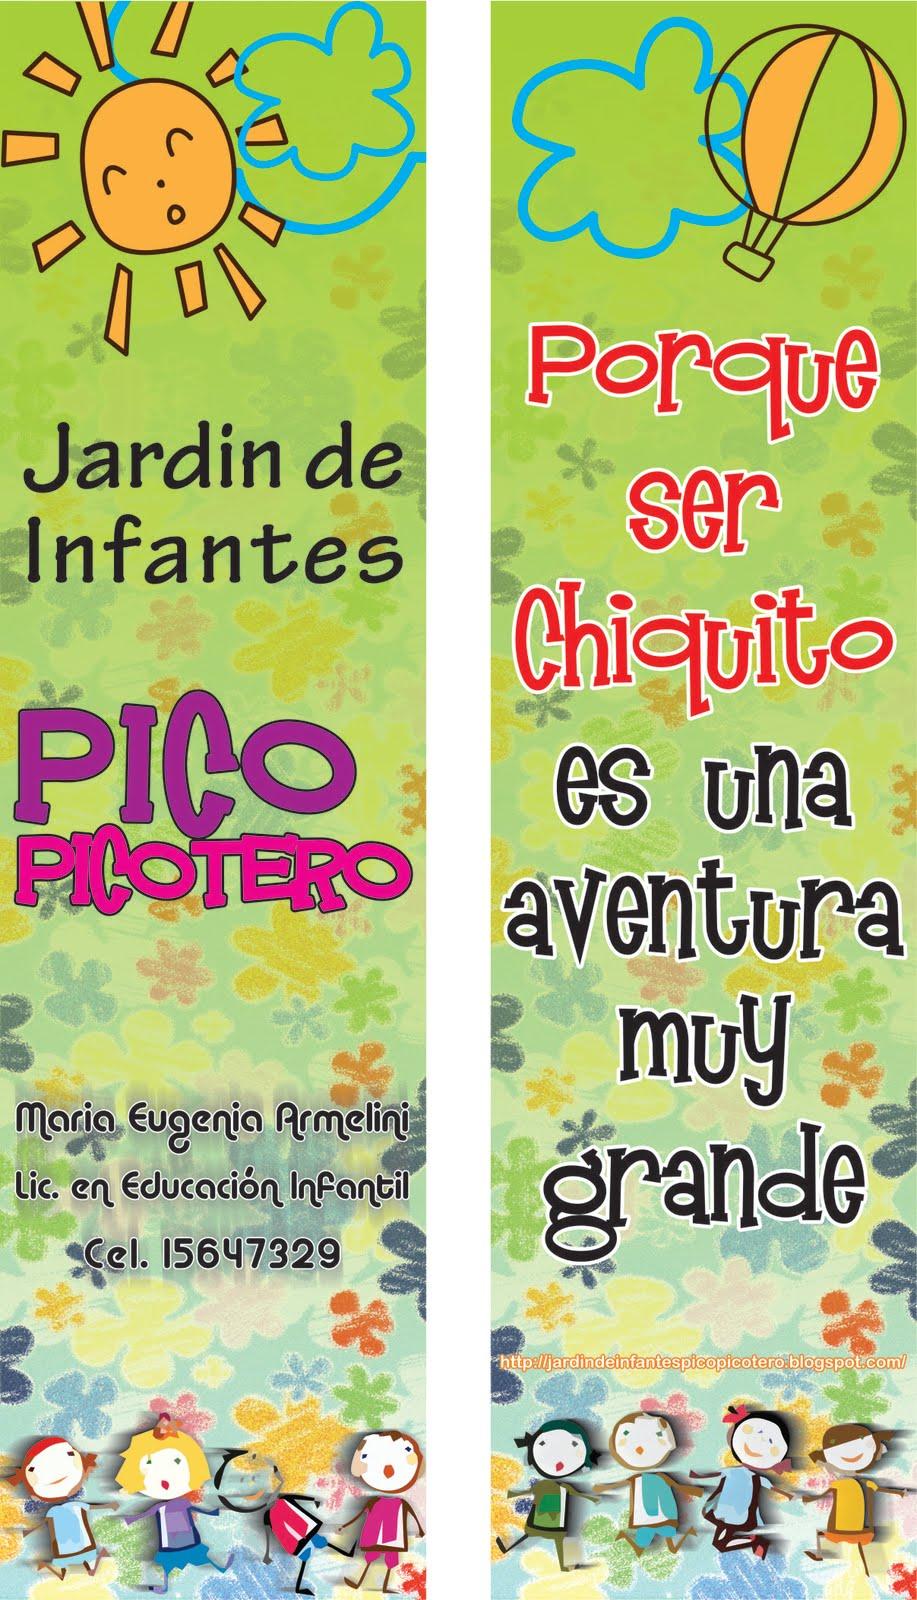 Jardin de infantes pico picotero for Canciones de jardin de infantes argentina